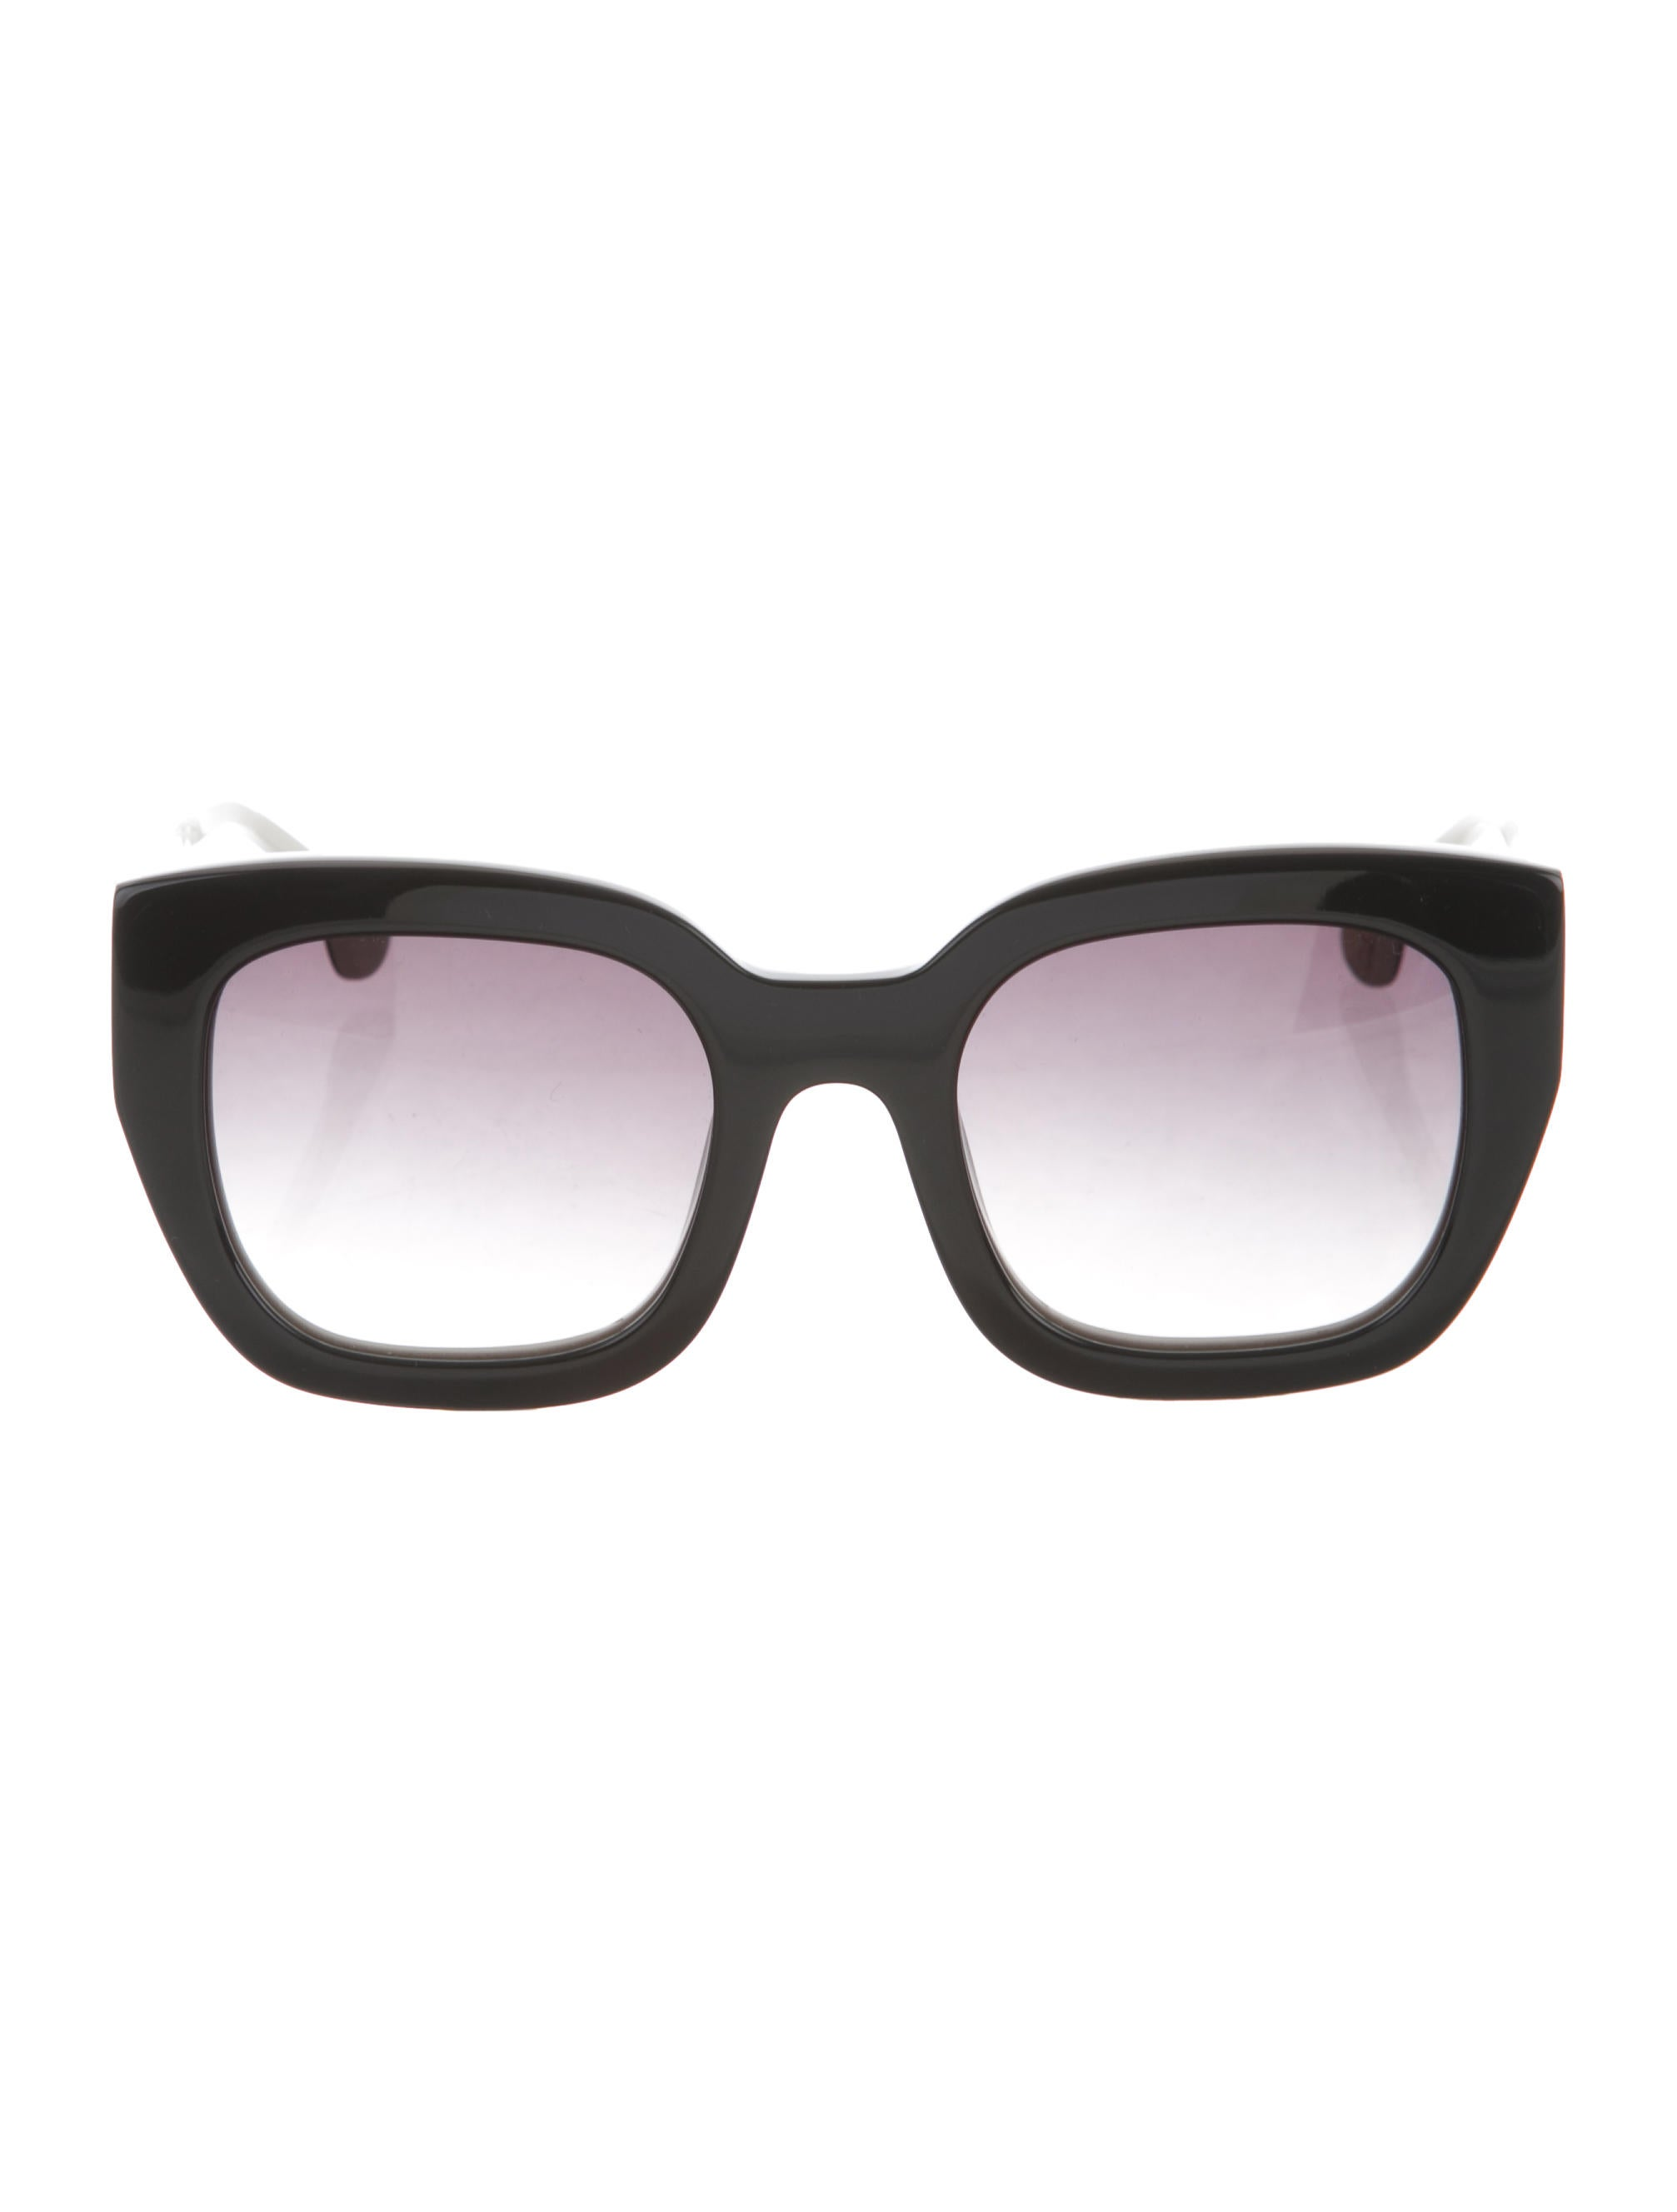 fd4b3fd751 Alice + Olivia Alice + Olivia Aberdeen Oversize Sunglasses ...